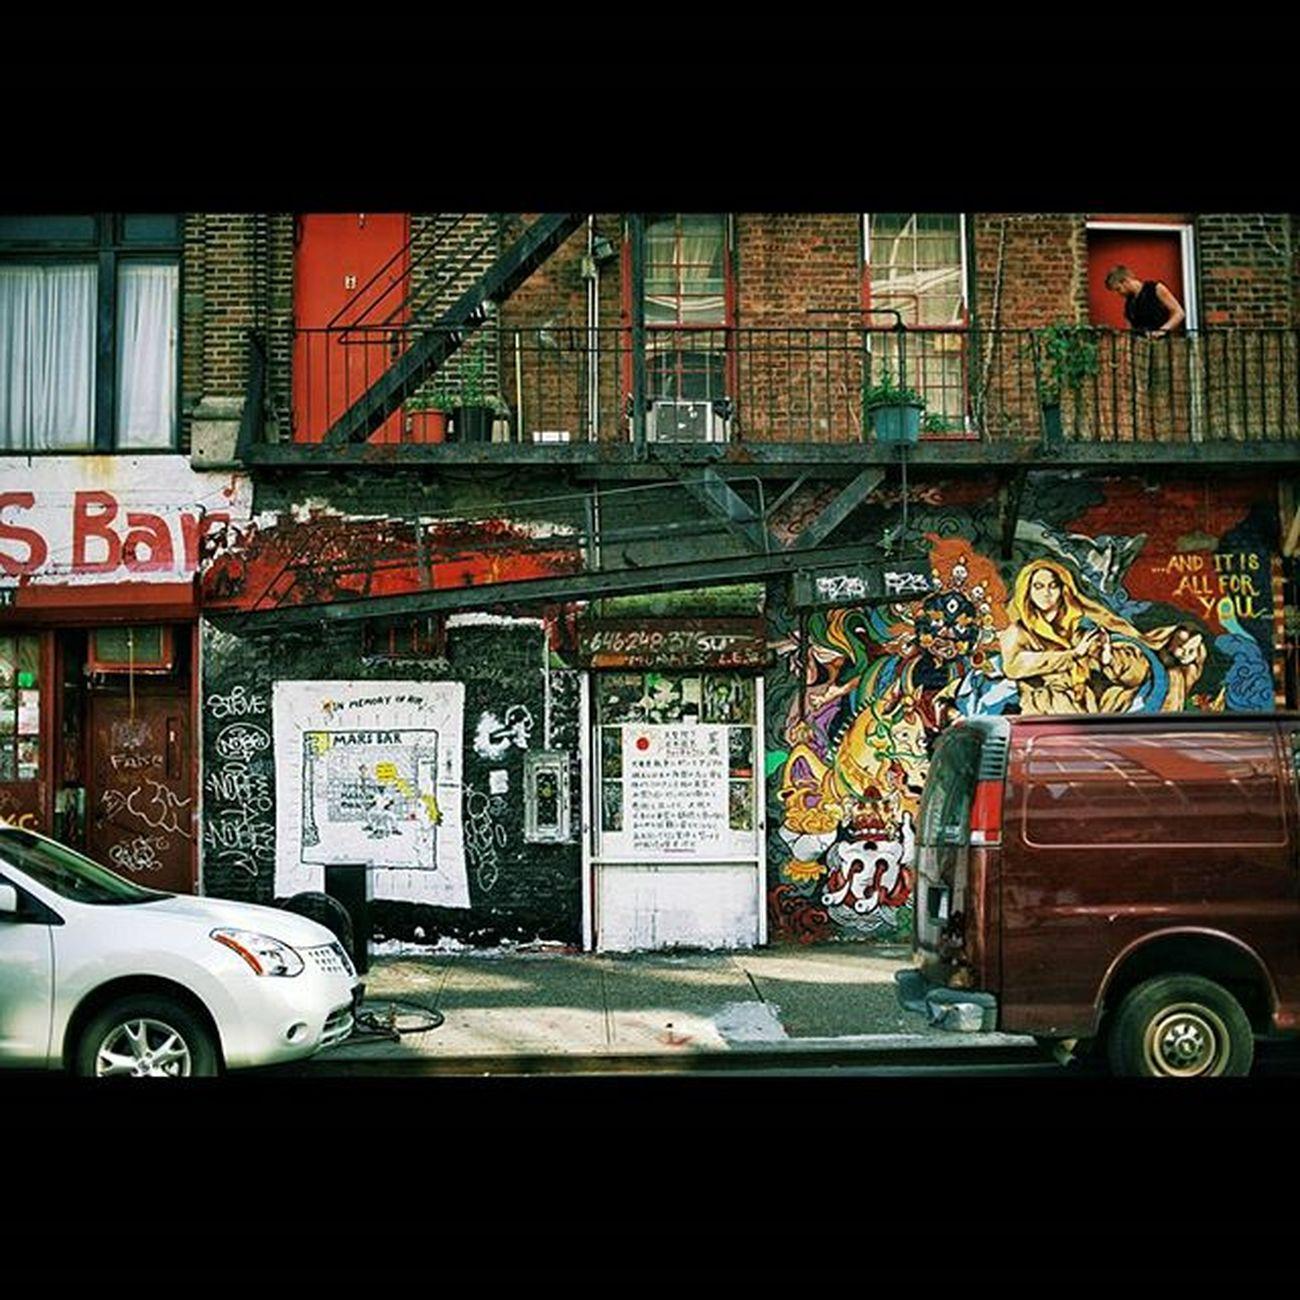 Bowery, Manhattan, NYC. August 2010.